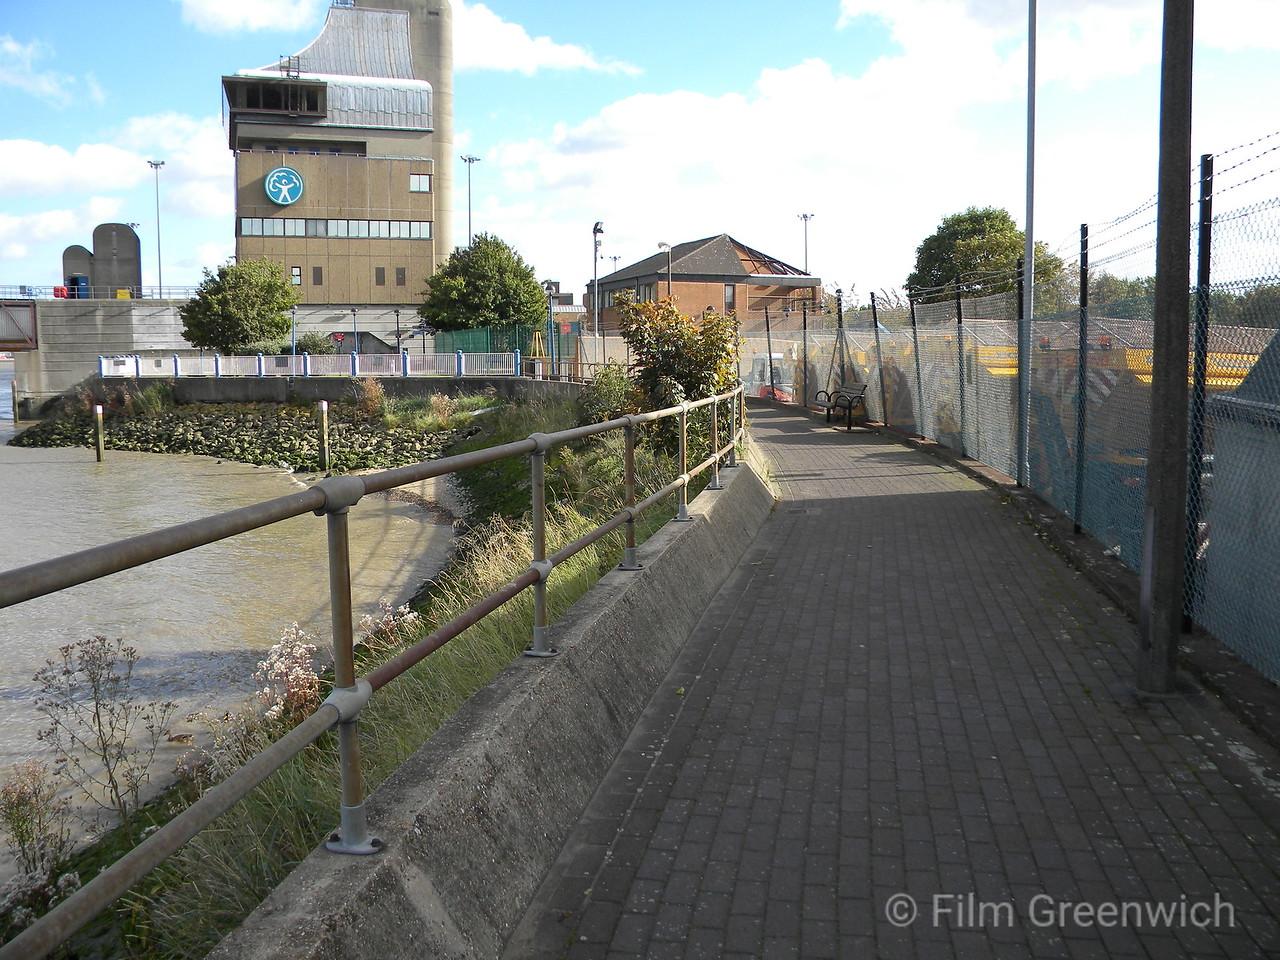 Thames Path - Thames Barrier